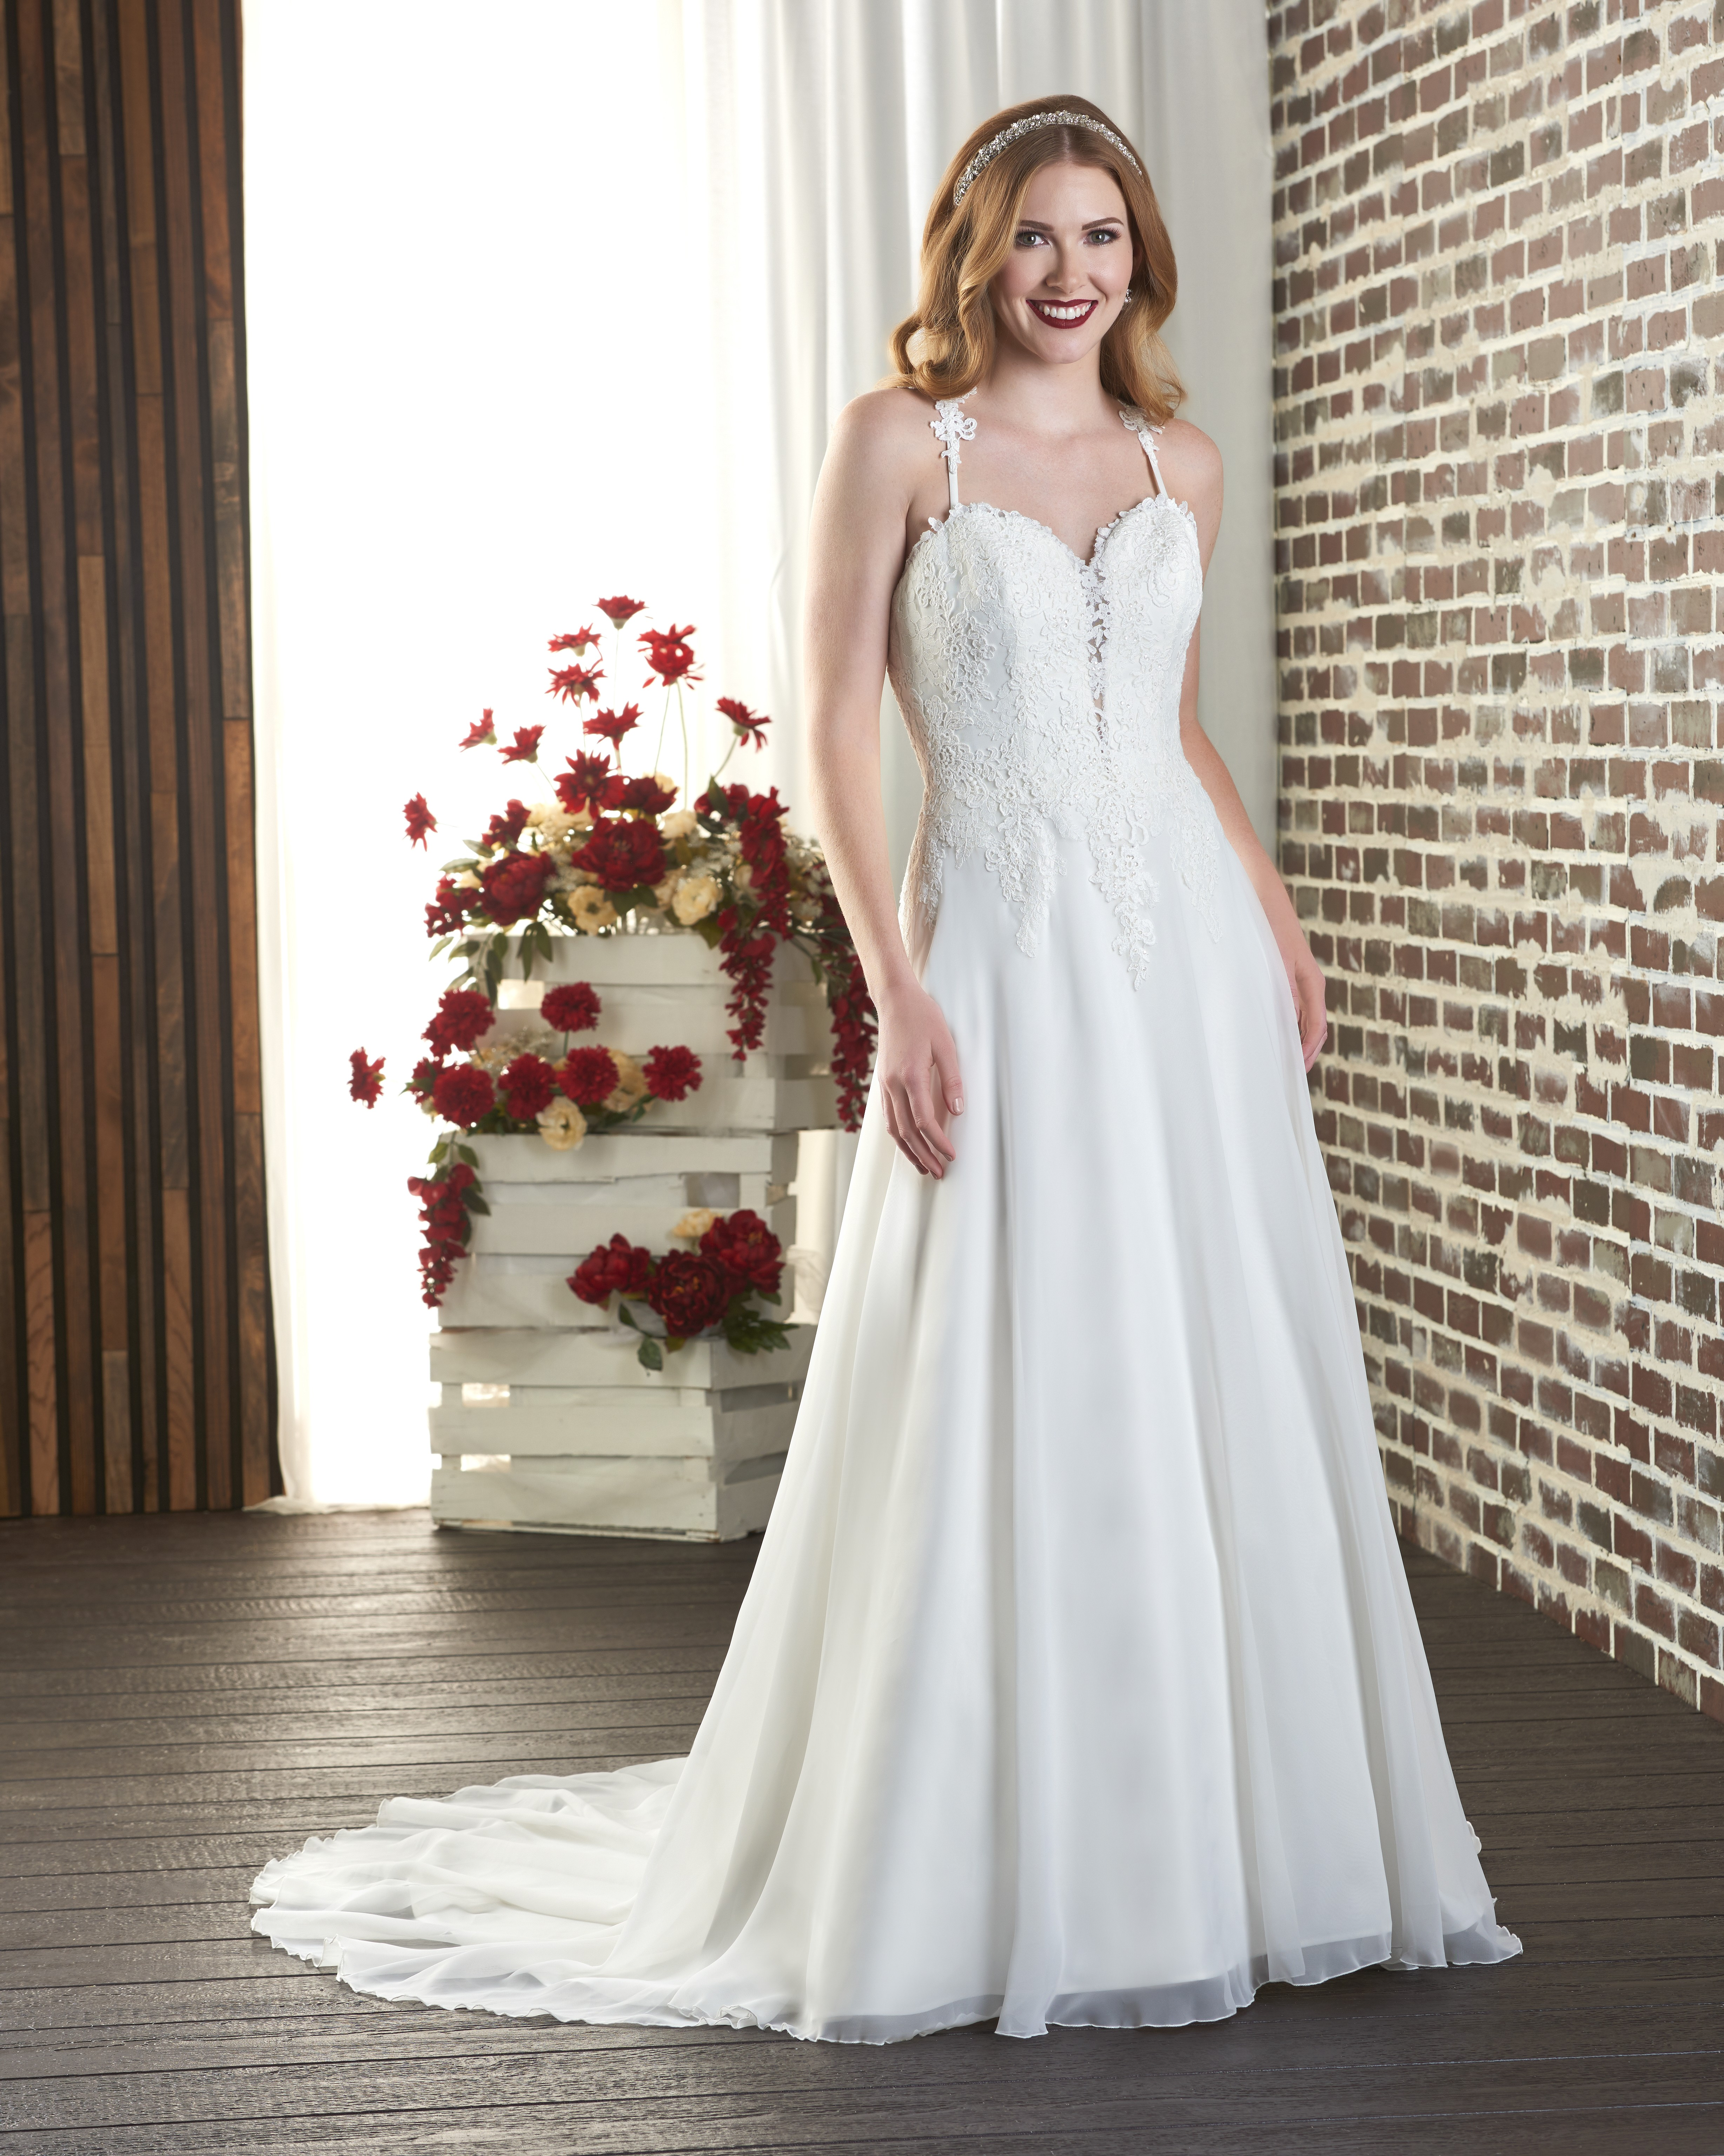 Wedding Dresses For Weddings Abroad. Stunning Stella York Spring ...